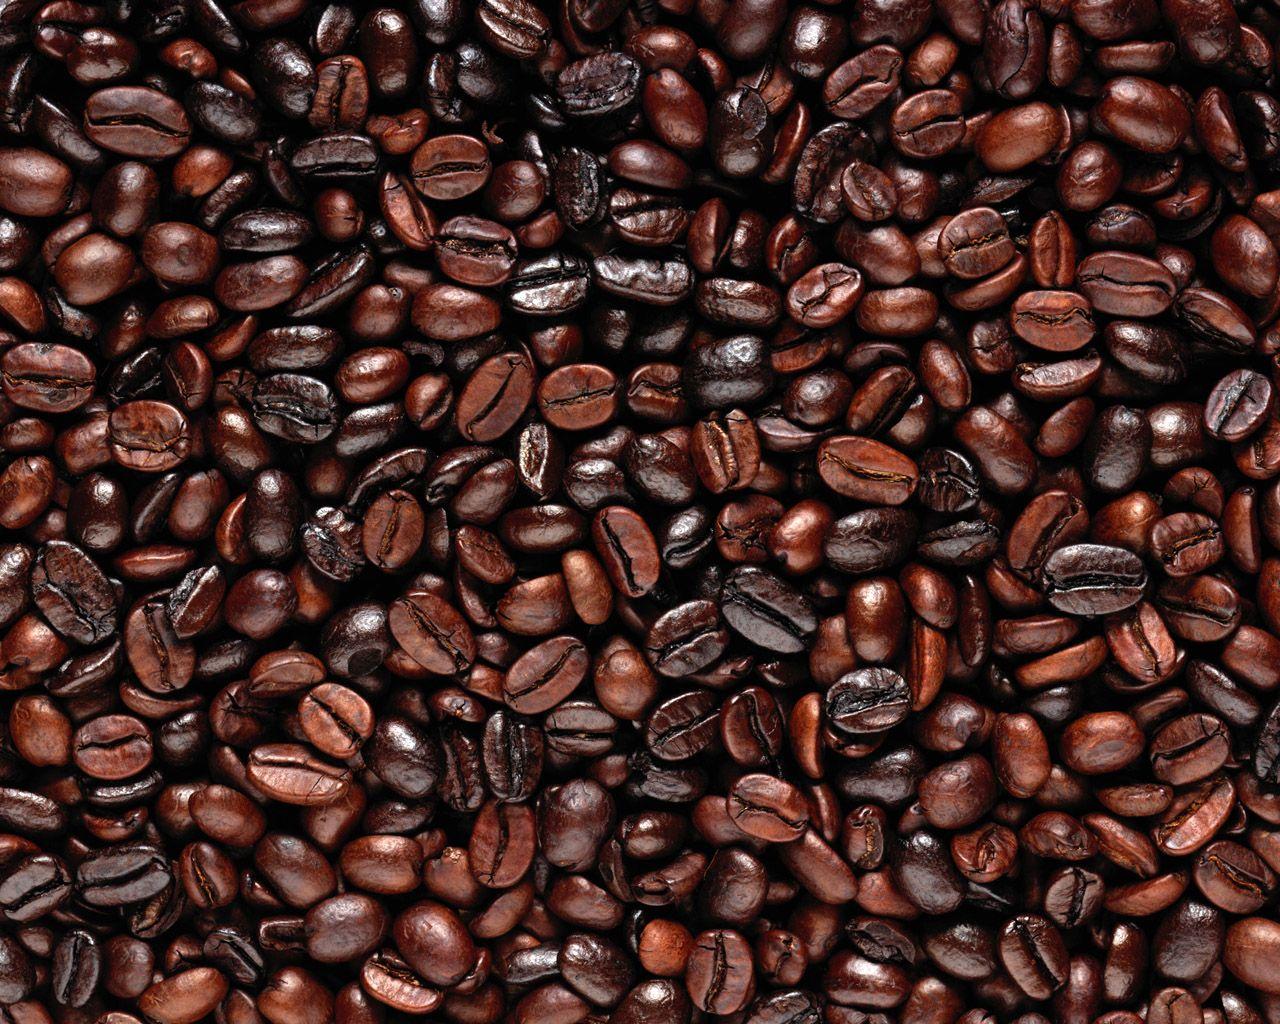 Coffee Beans Brown Organic Coffee Beans Arabica Coffee Beans Organic Coffee